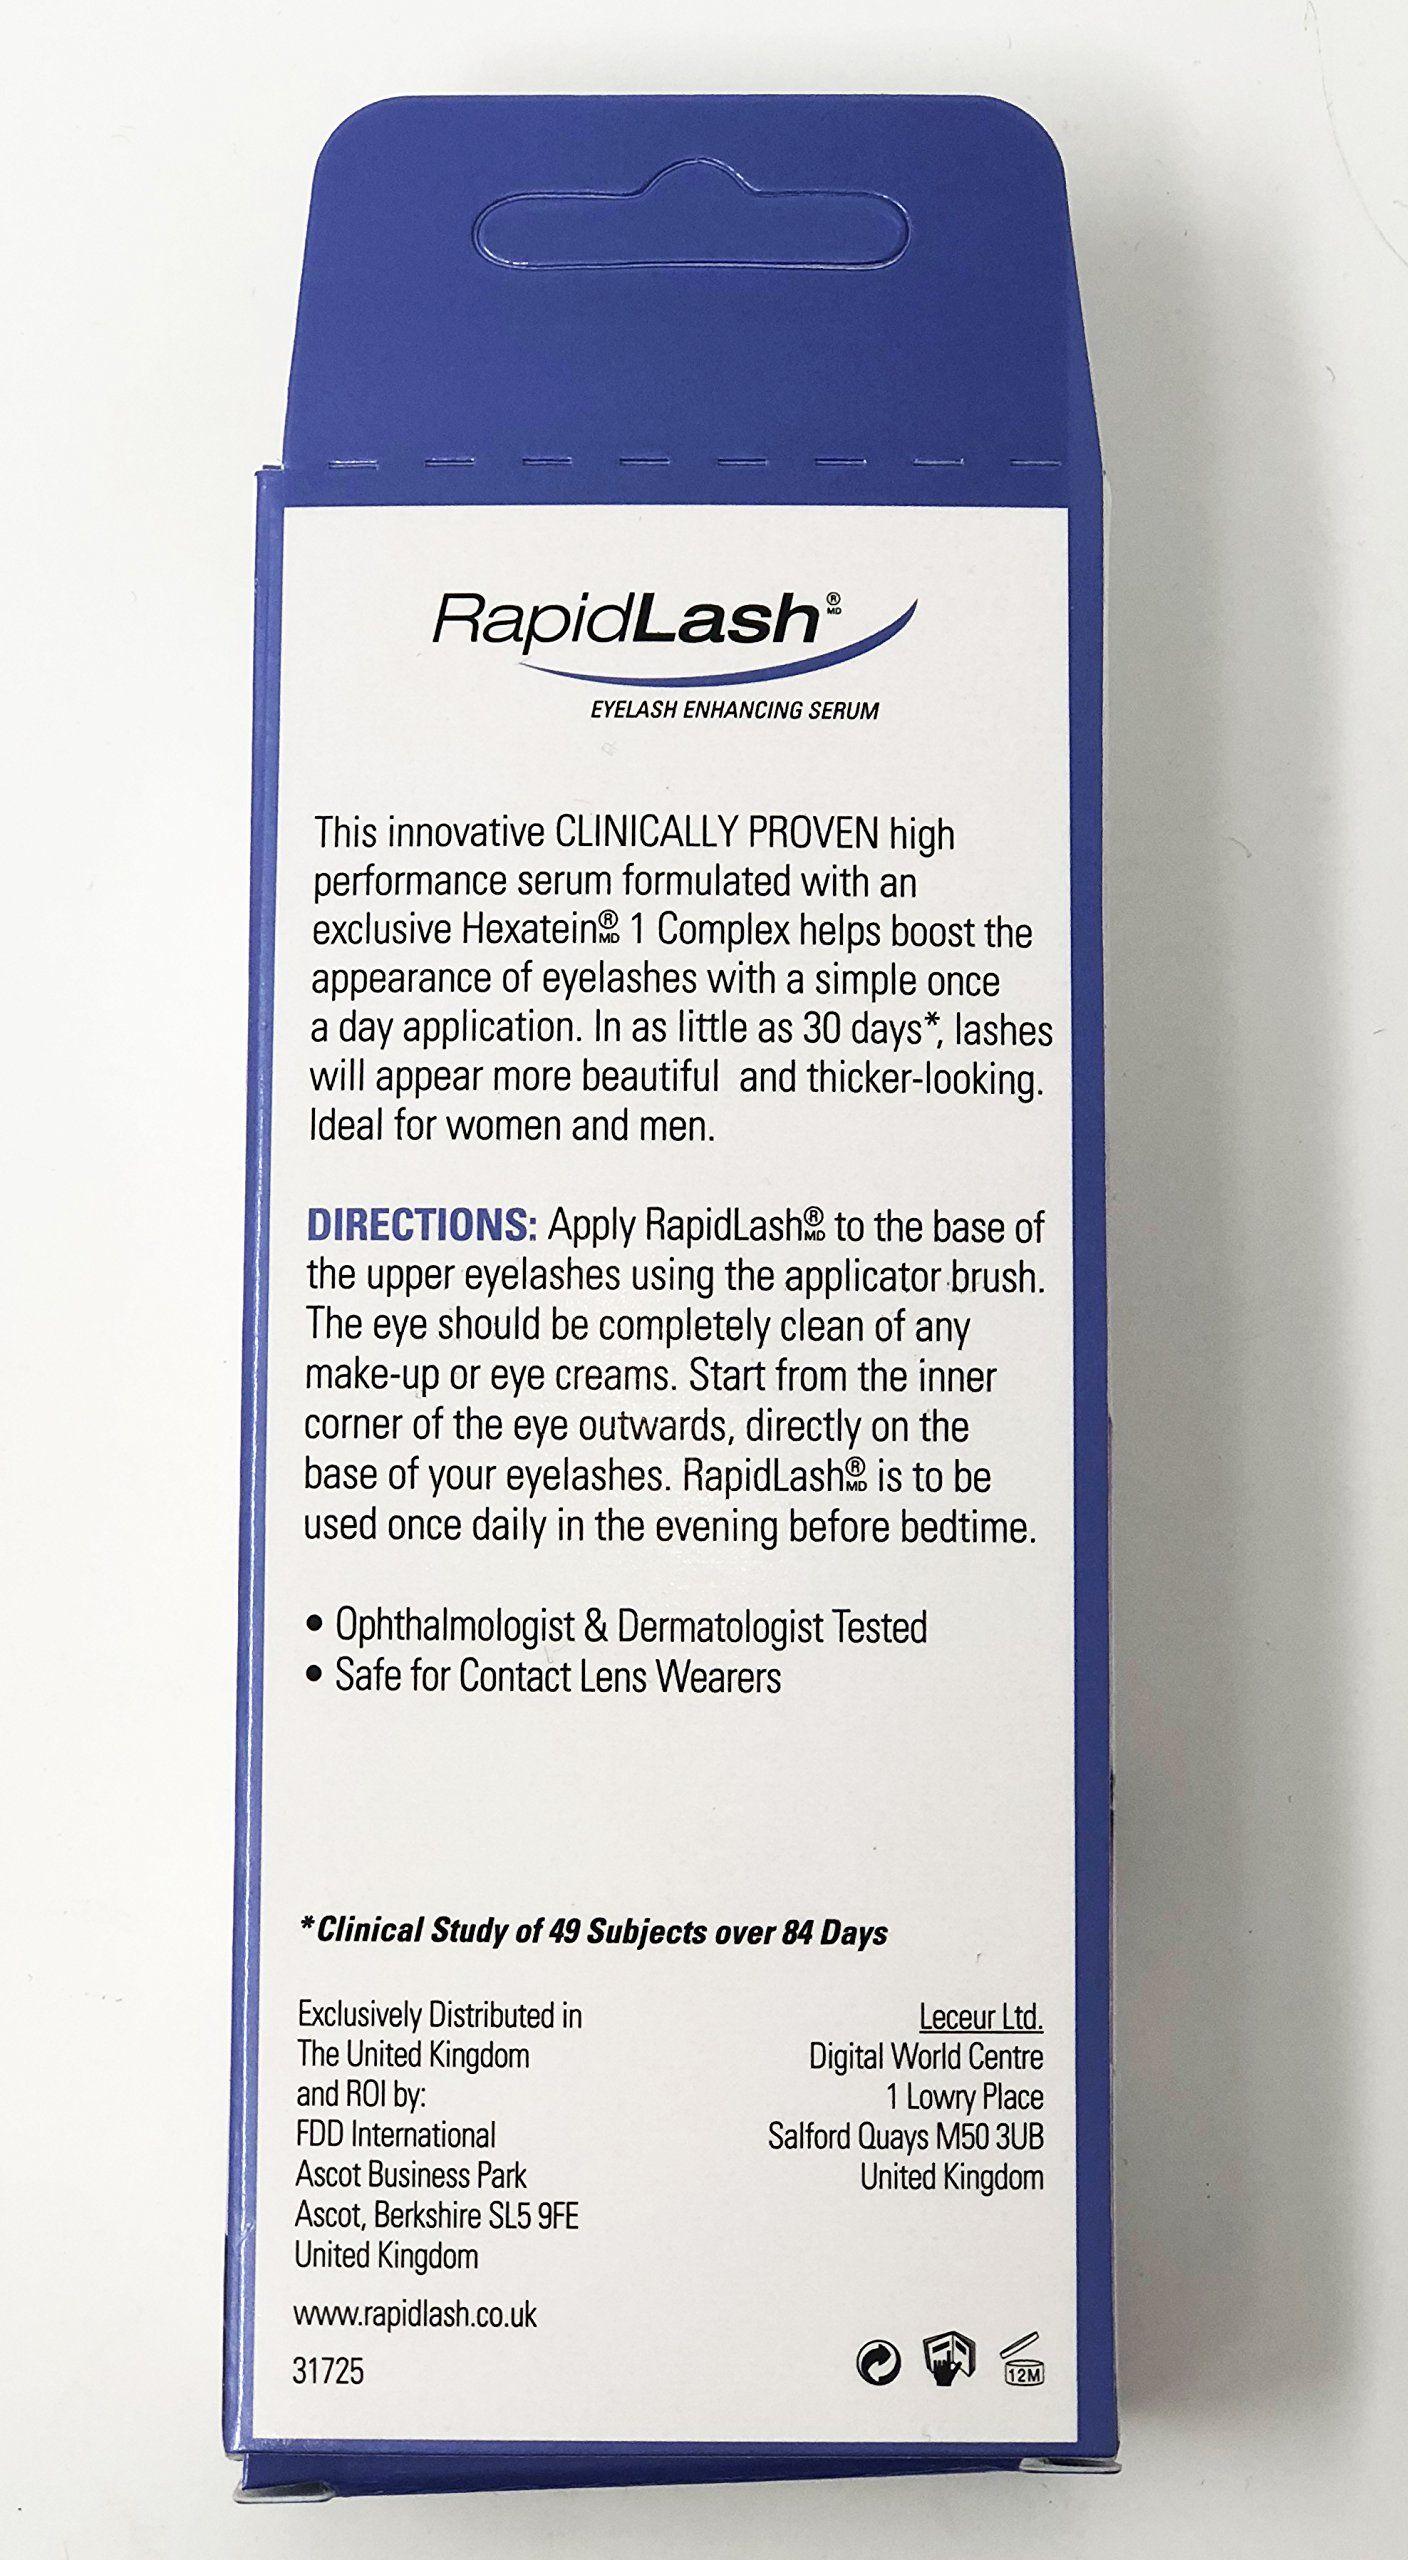 32681356d5b Rapidlash Eyelash and Eyebrow Enhancing Serum (3ml),0.1-Fluid Ounces Bottle,